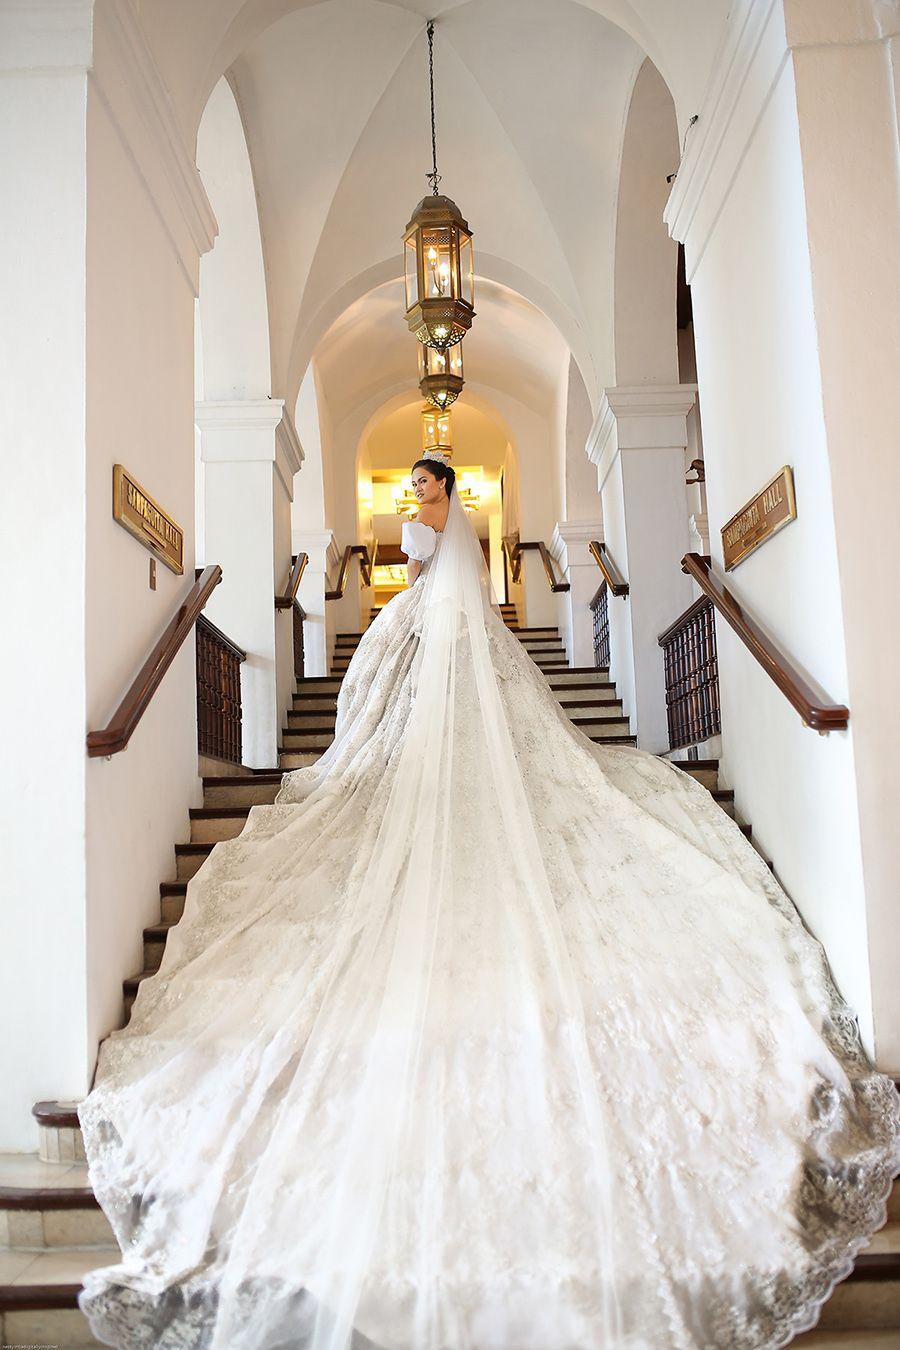 Fairy Tale Wedding With A Cinderella Bride And Disney Princess Bridesmaids Long Train Wedding Dress Wedding Dresses Cinderella Disney Princess Wedding Dresses [ 1350 x 900 Pixel ]